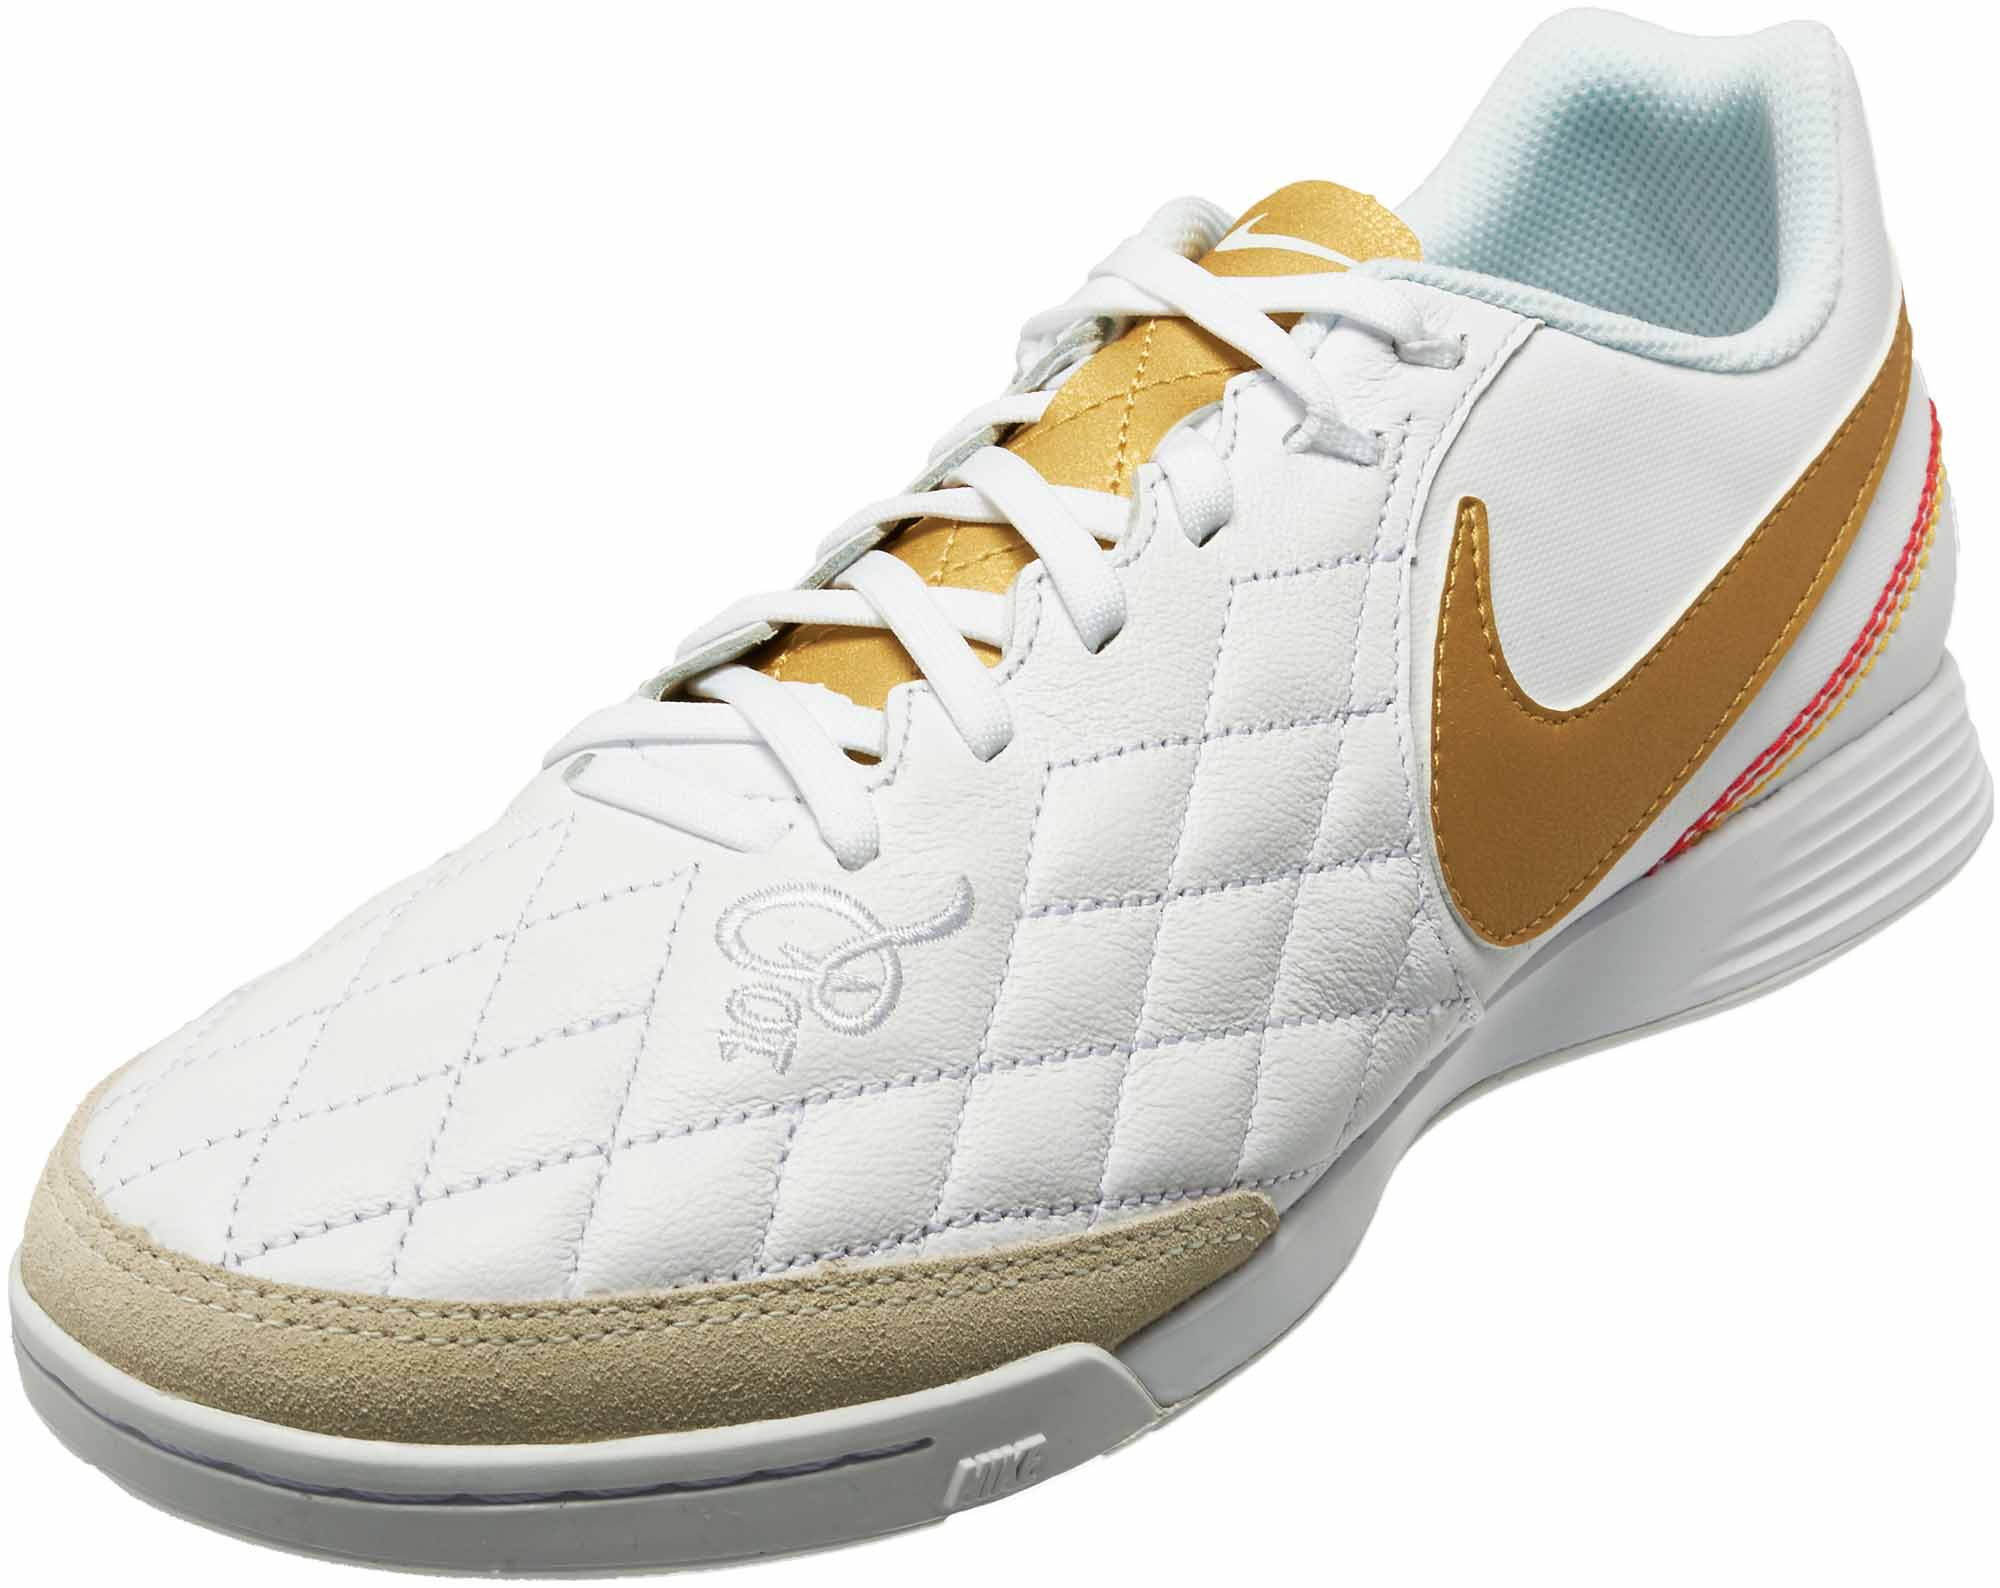 81a90a11bf8 Nike 10R Lunar TiempoX Legend 7 Academy IC - White Metallic Gold ...